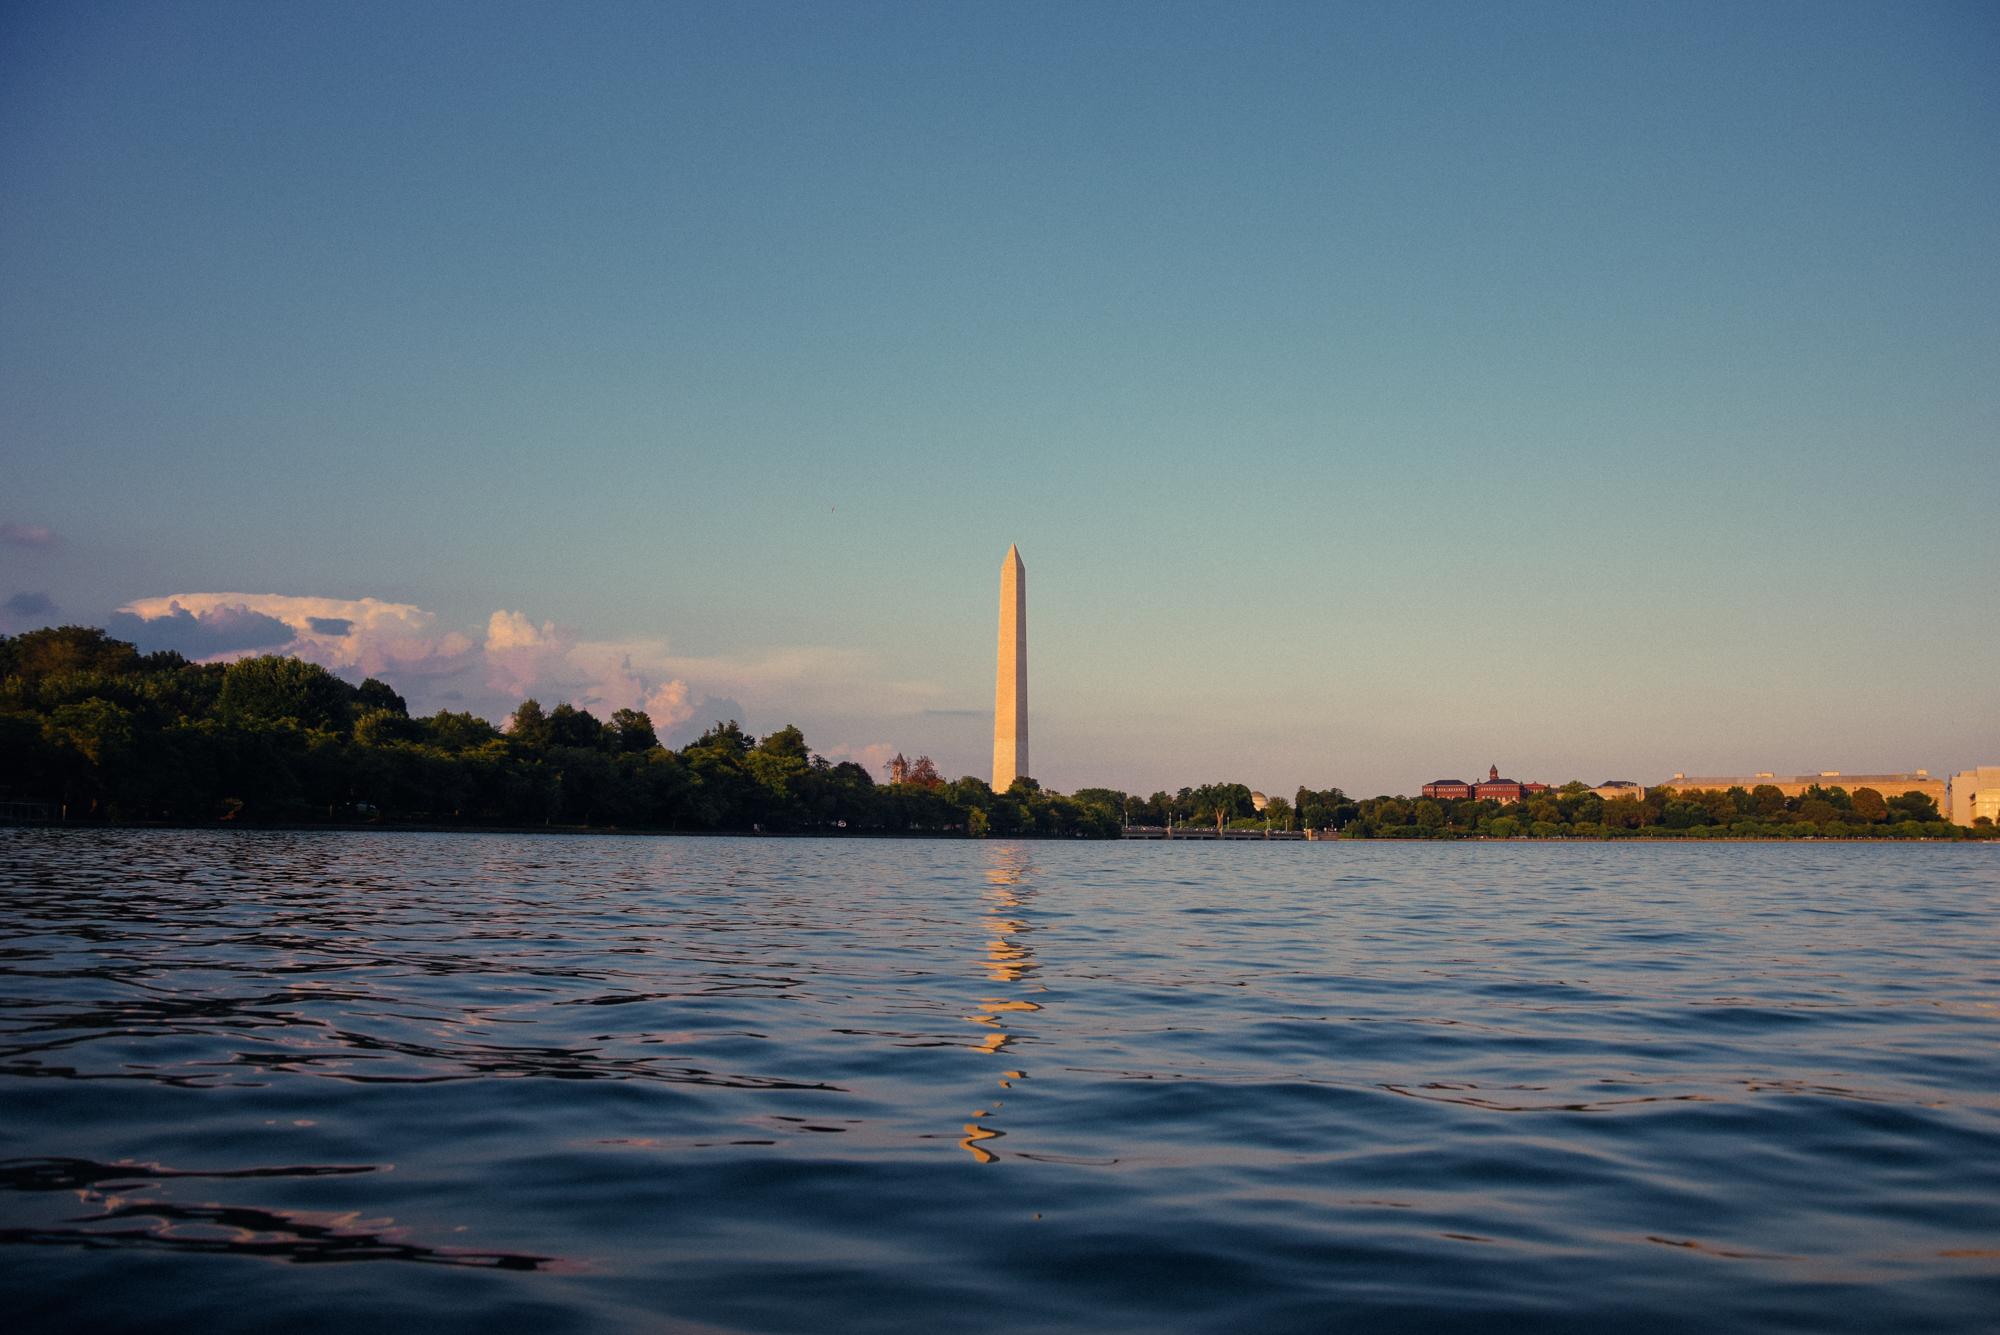 Washington D.C. USA 2018 | A Beautiful Distraction by Ruo Ling Lu